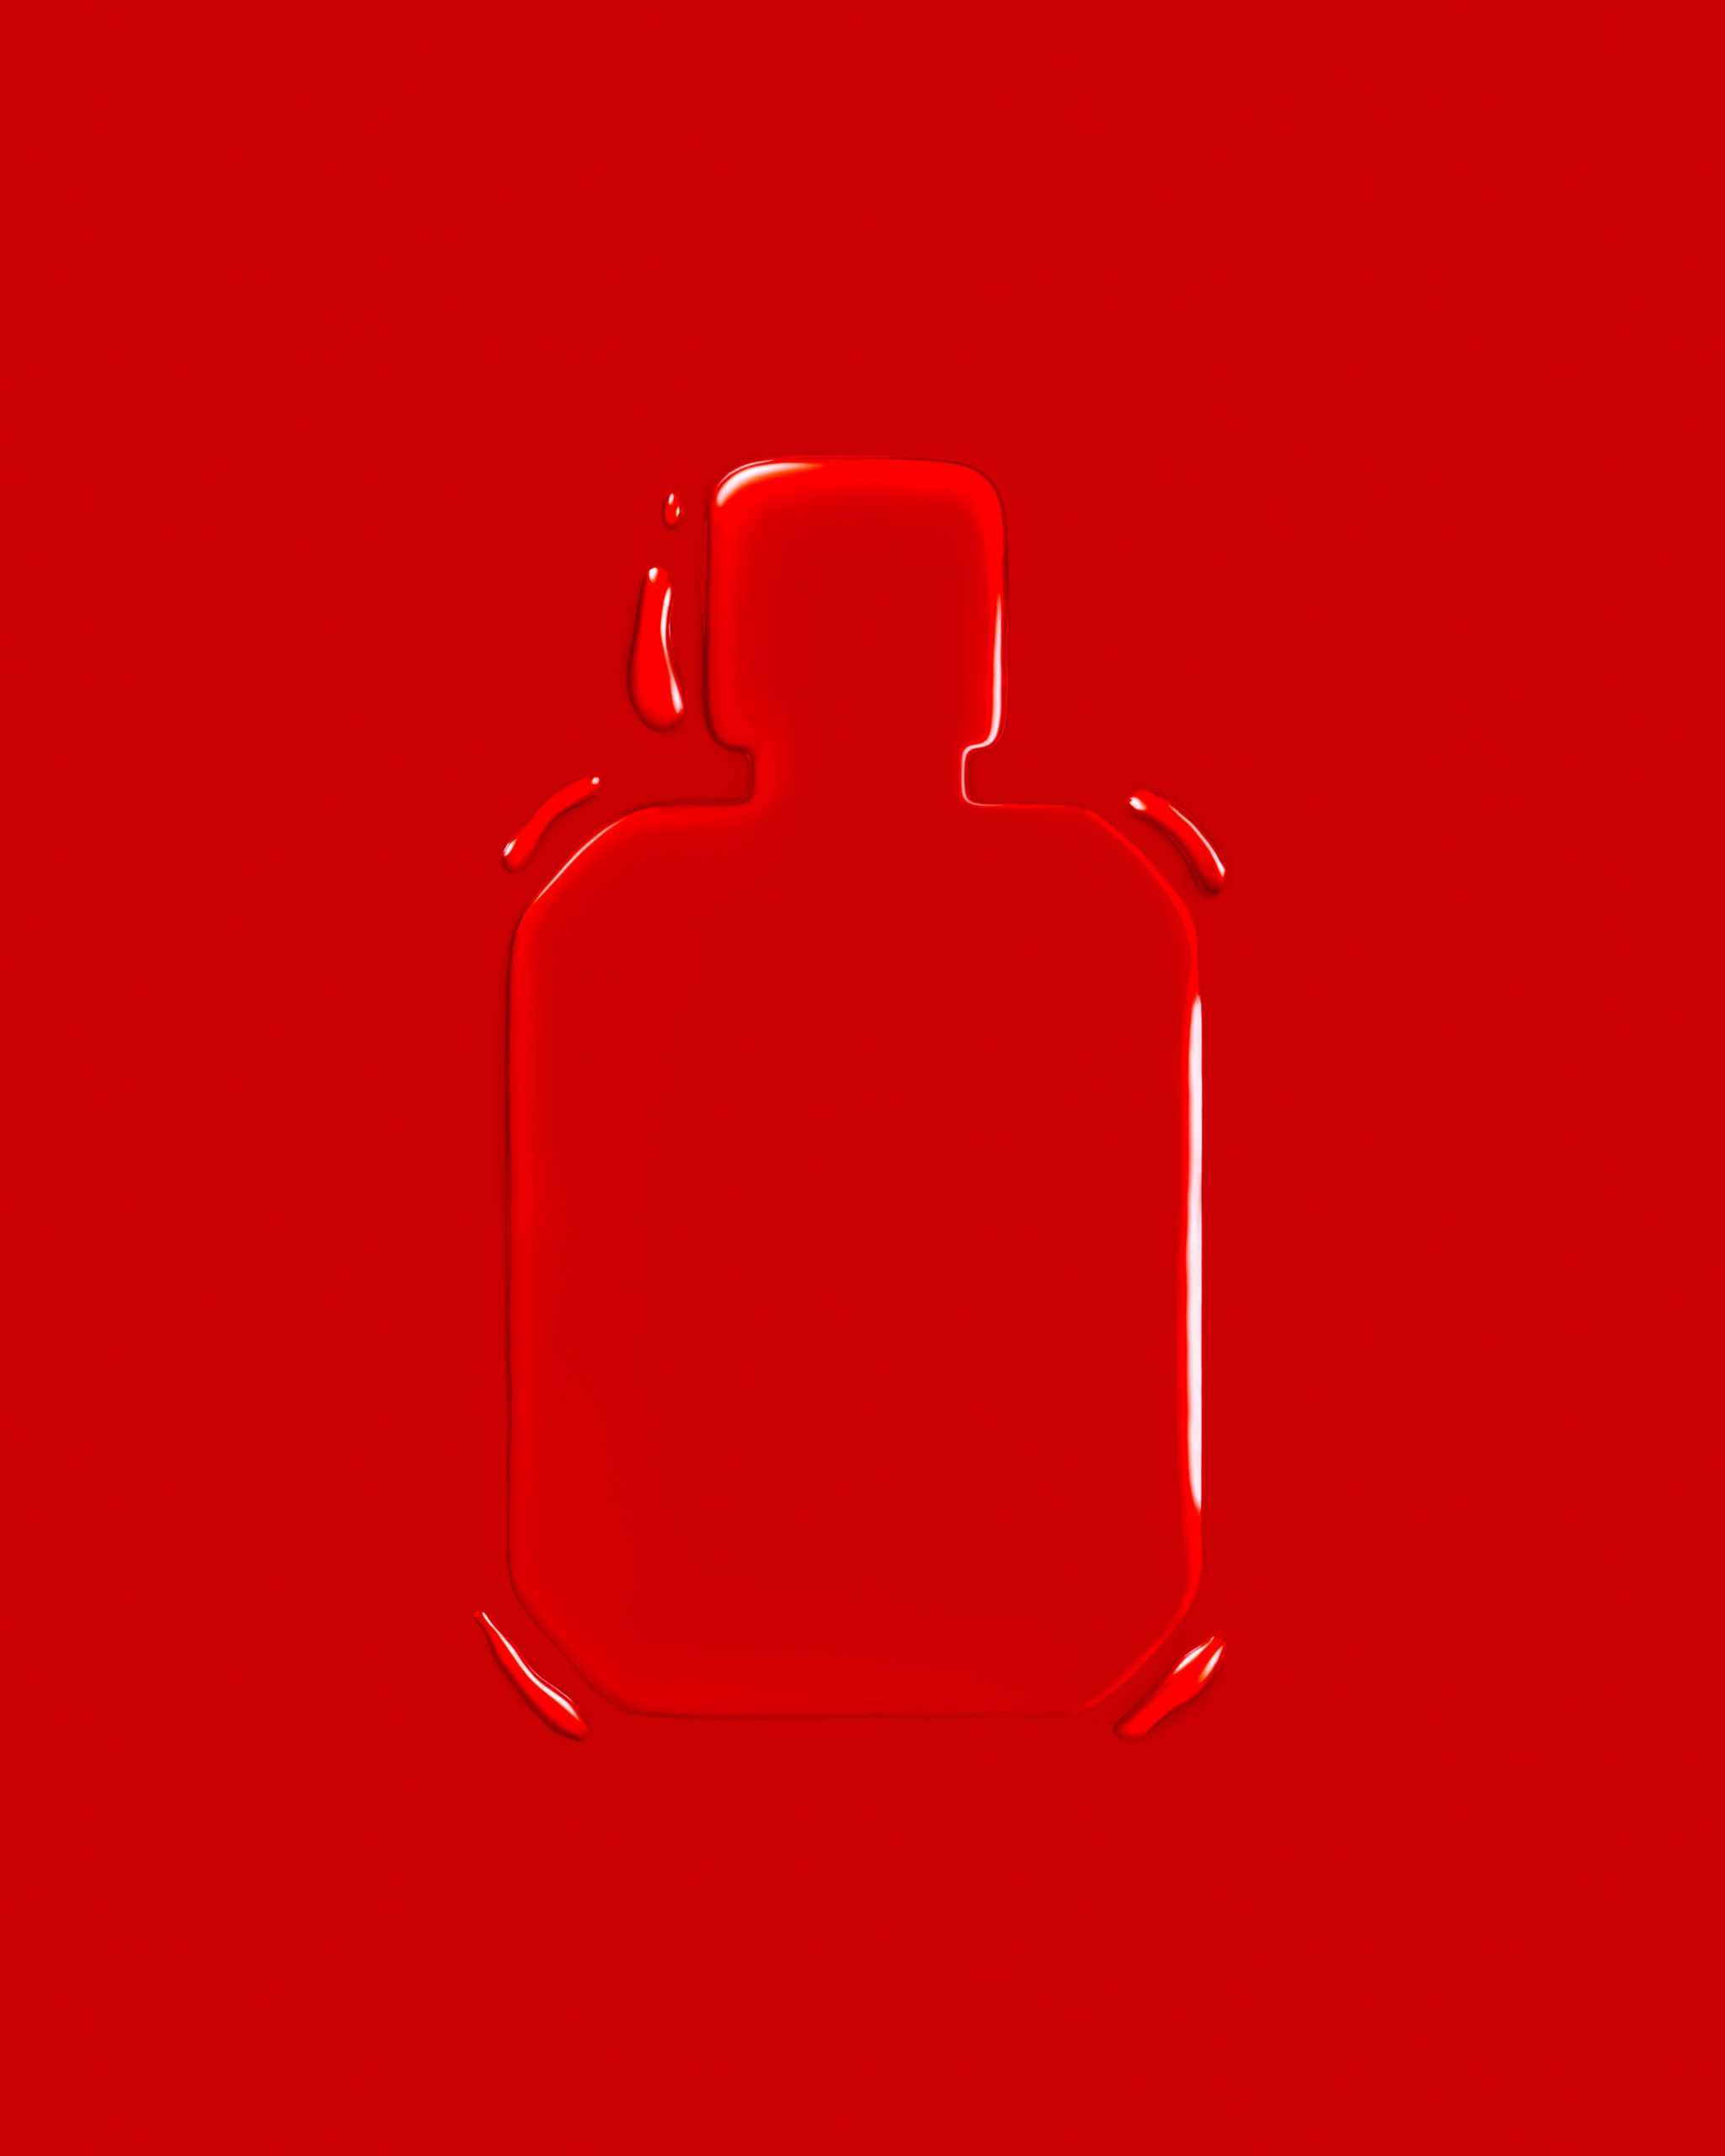 CORP_Liquid_0188_V1_FLAT_HR_Web_4x5